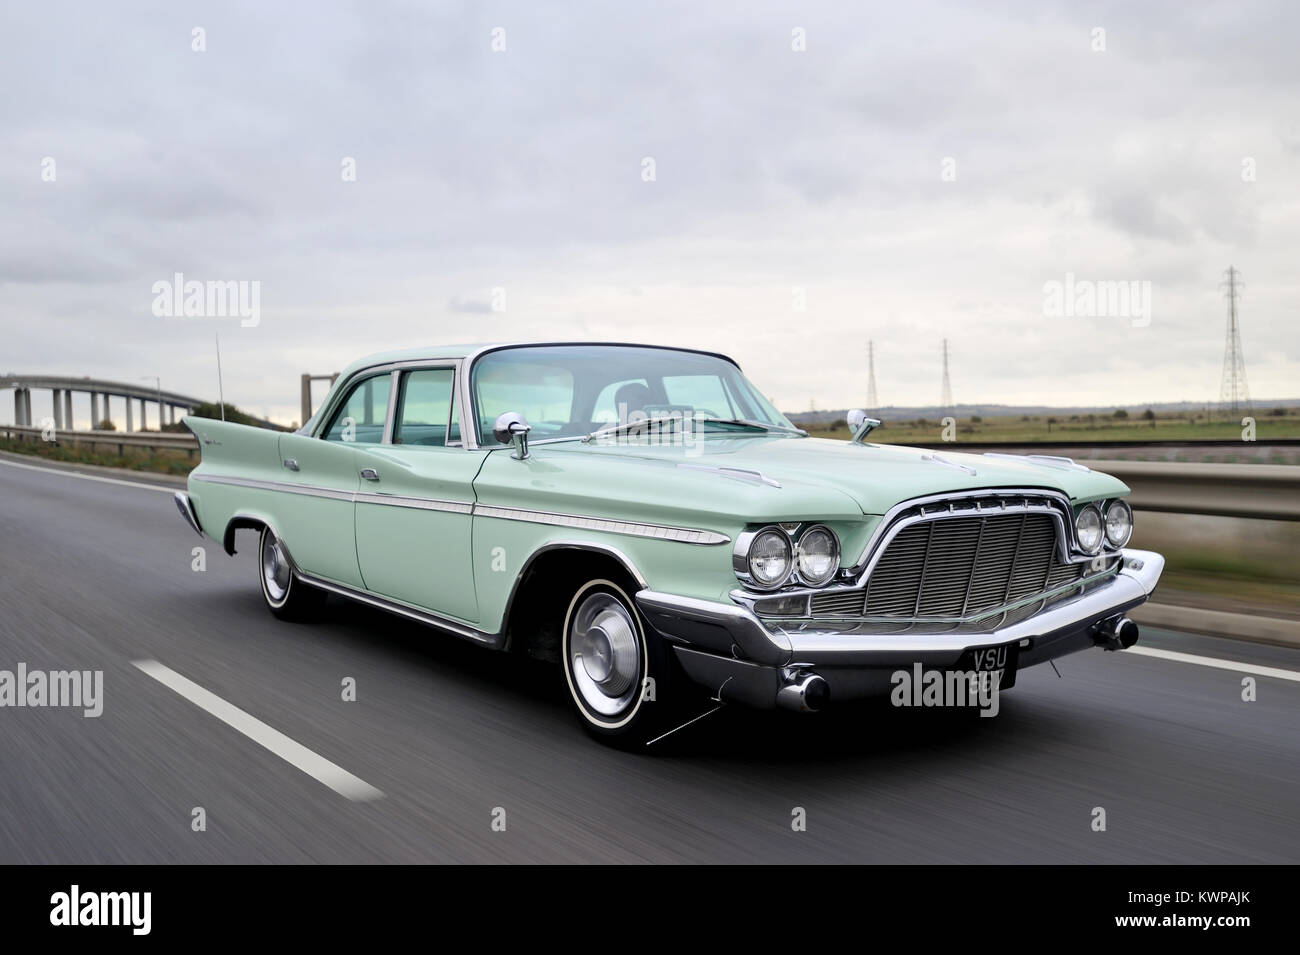 1958 DeSoto Adventurer classic American car - Stock Image